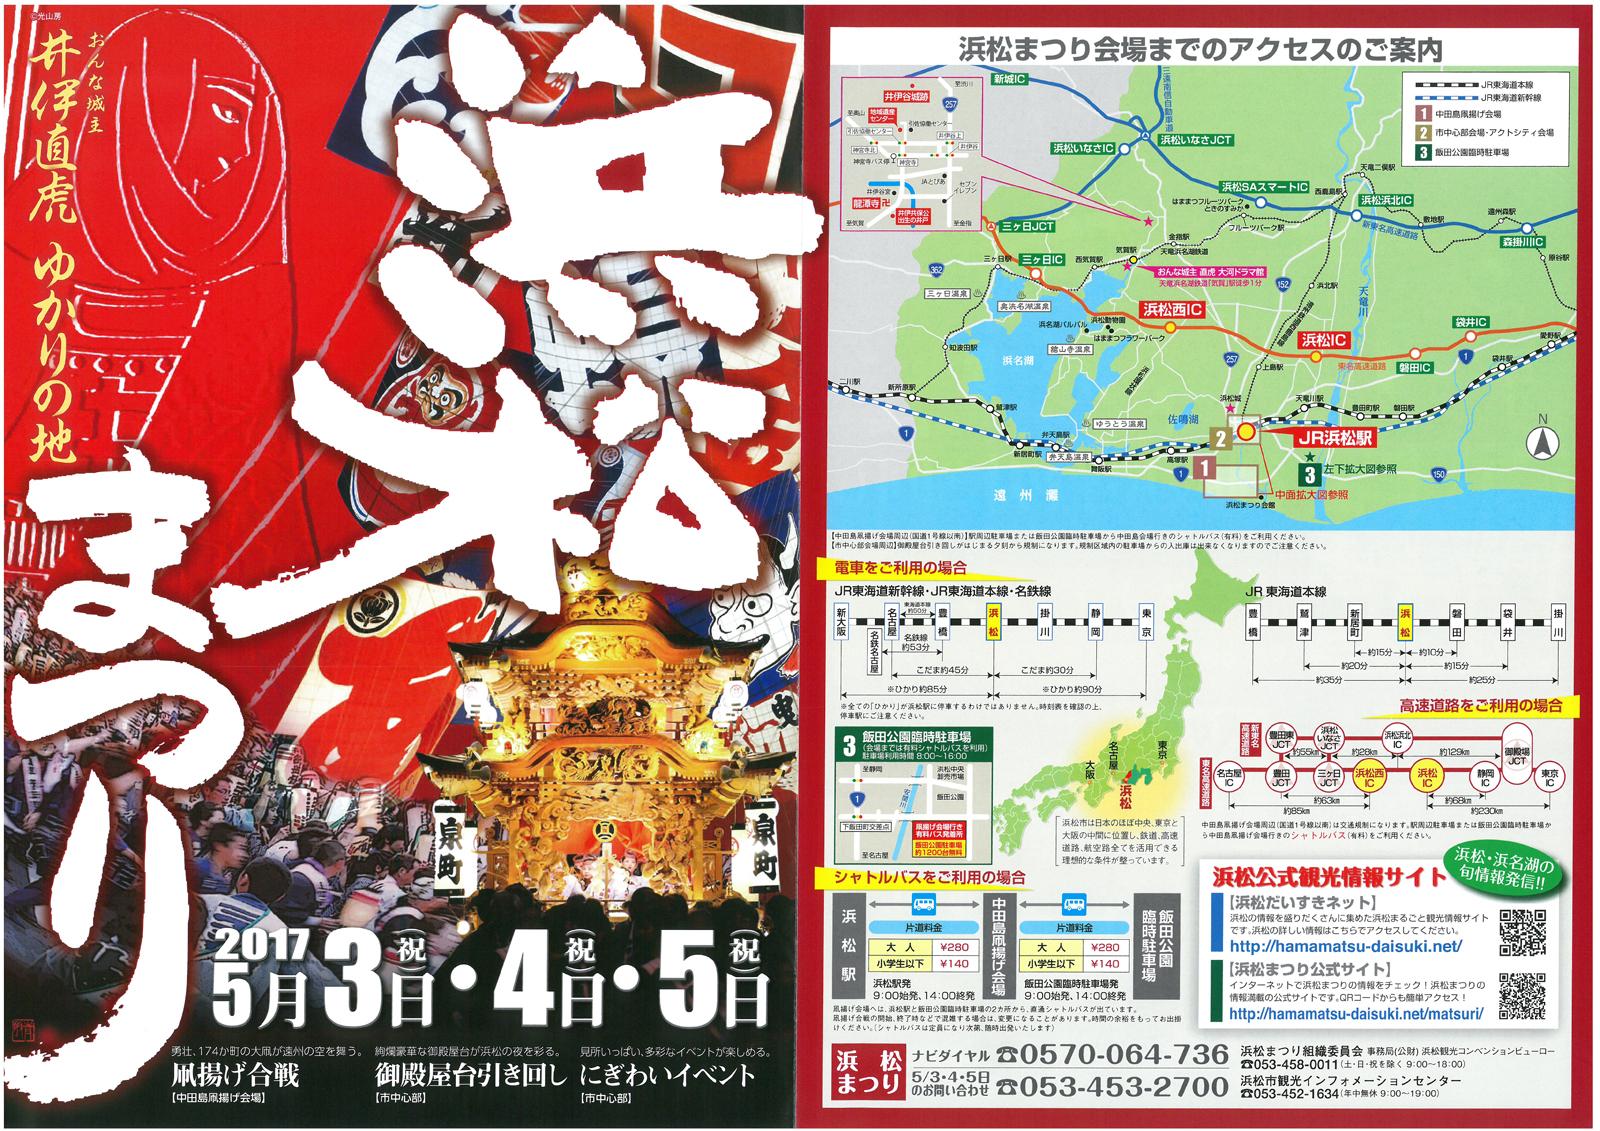 http://www.inhamamatsu.com/japanese/recommend/hamamatsu%20fes_omo.jpg